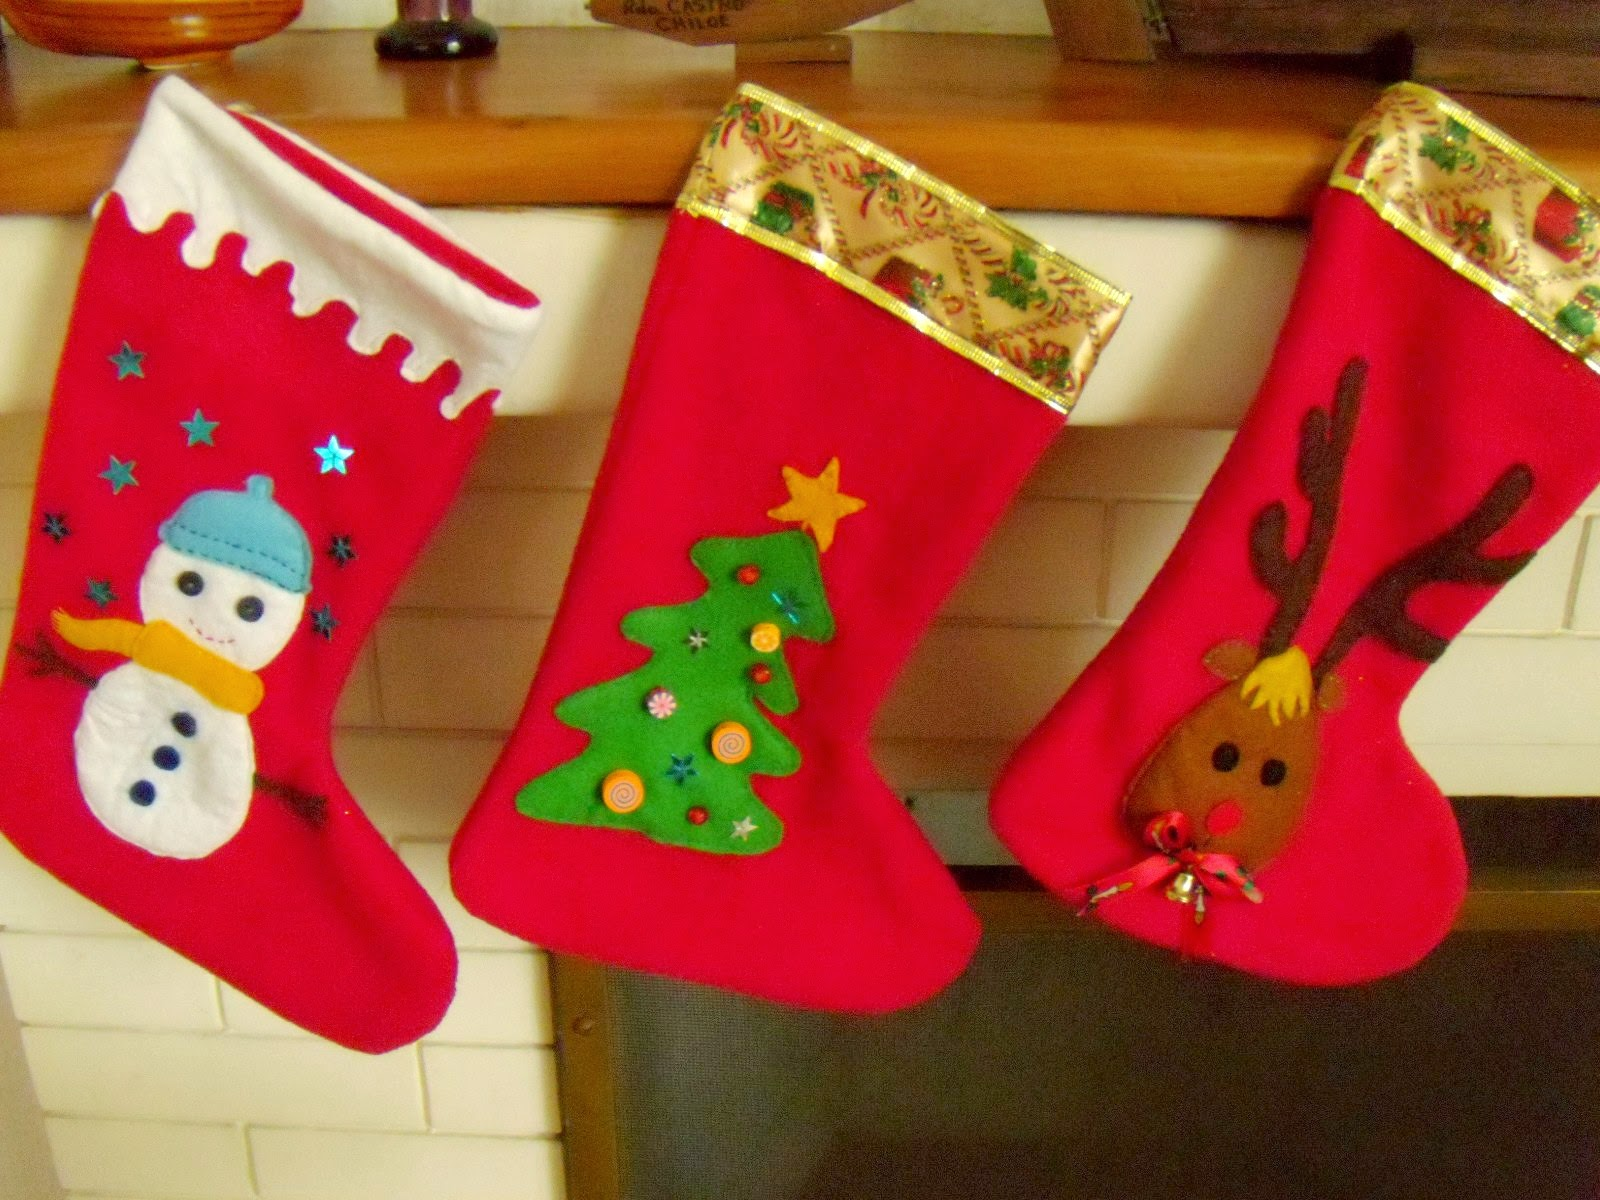 imagen de lindas botas navideñas